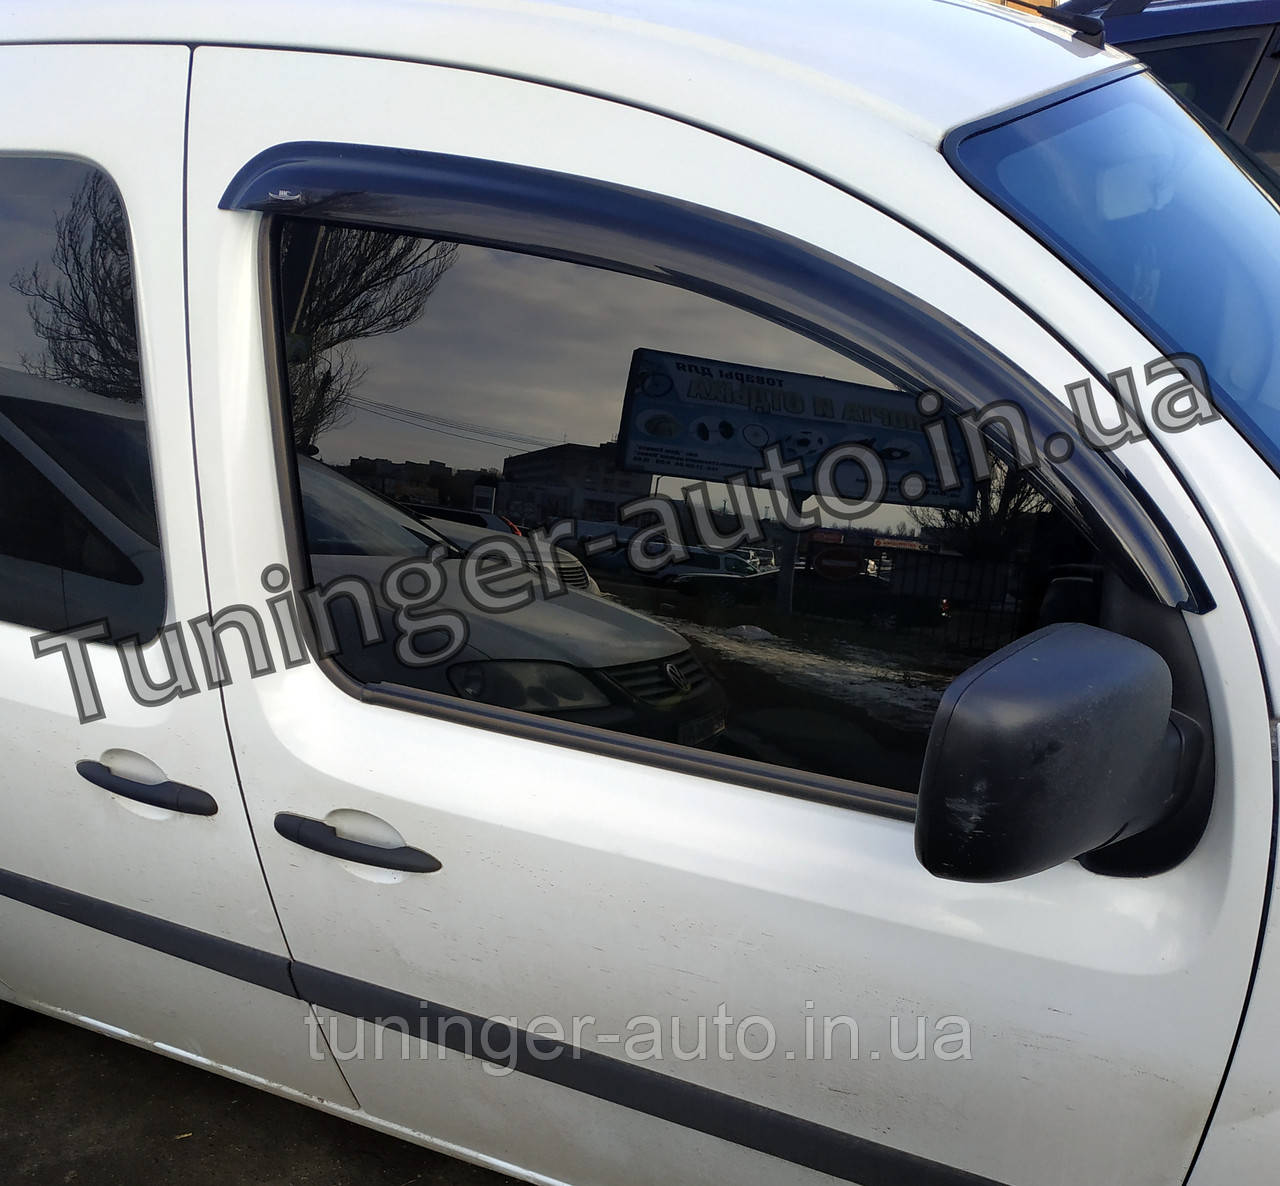 Ветровики, дефлекторы окон Renault Kangoo 2008-/2013- (Hic)